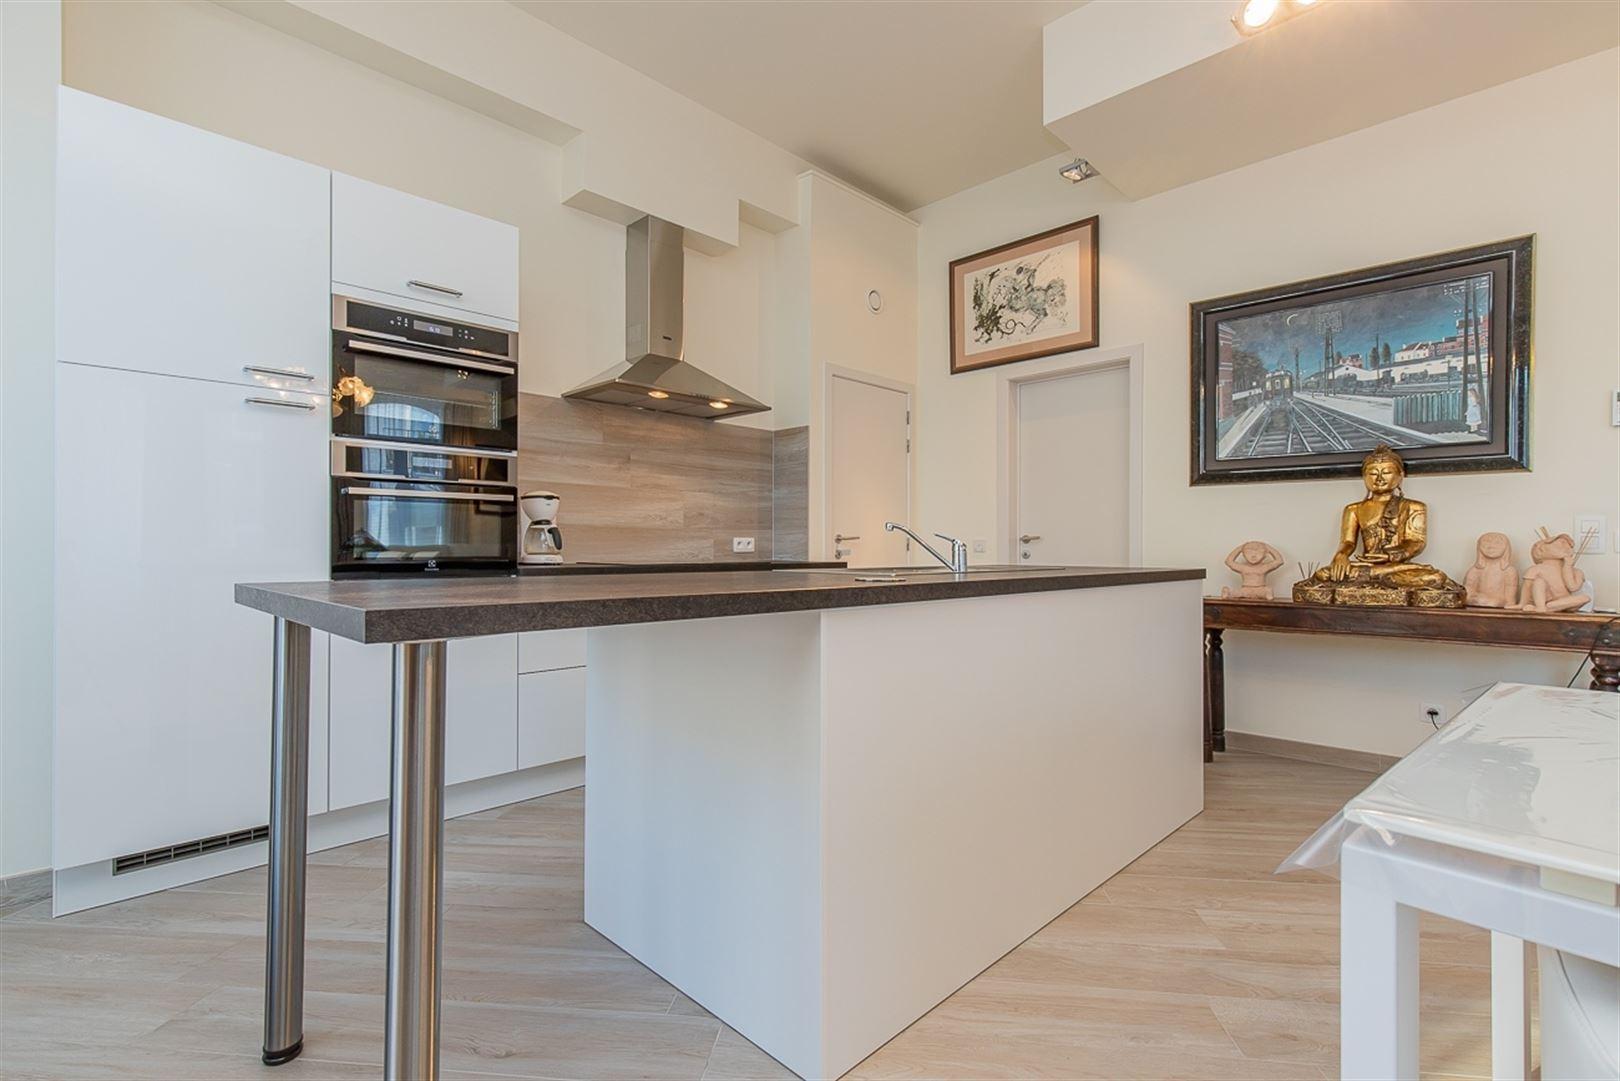 Foto 6 : Duplex/Penthouse te 9200 DENDERMONDE (België) - Prijs € 399.000